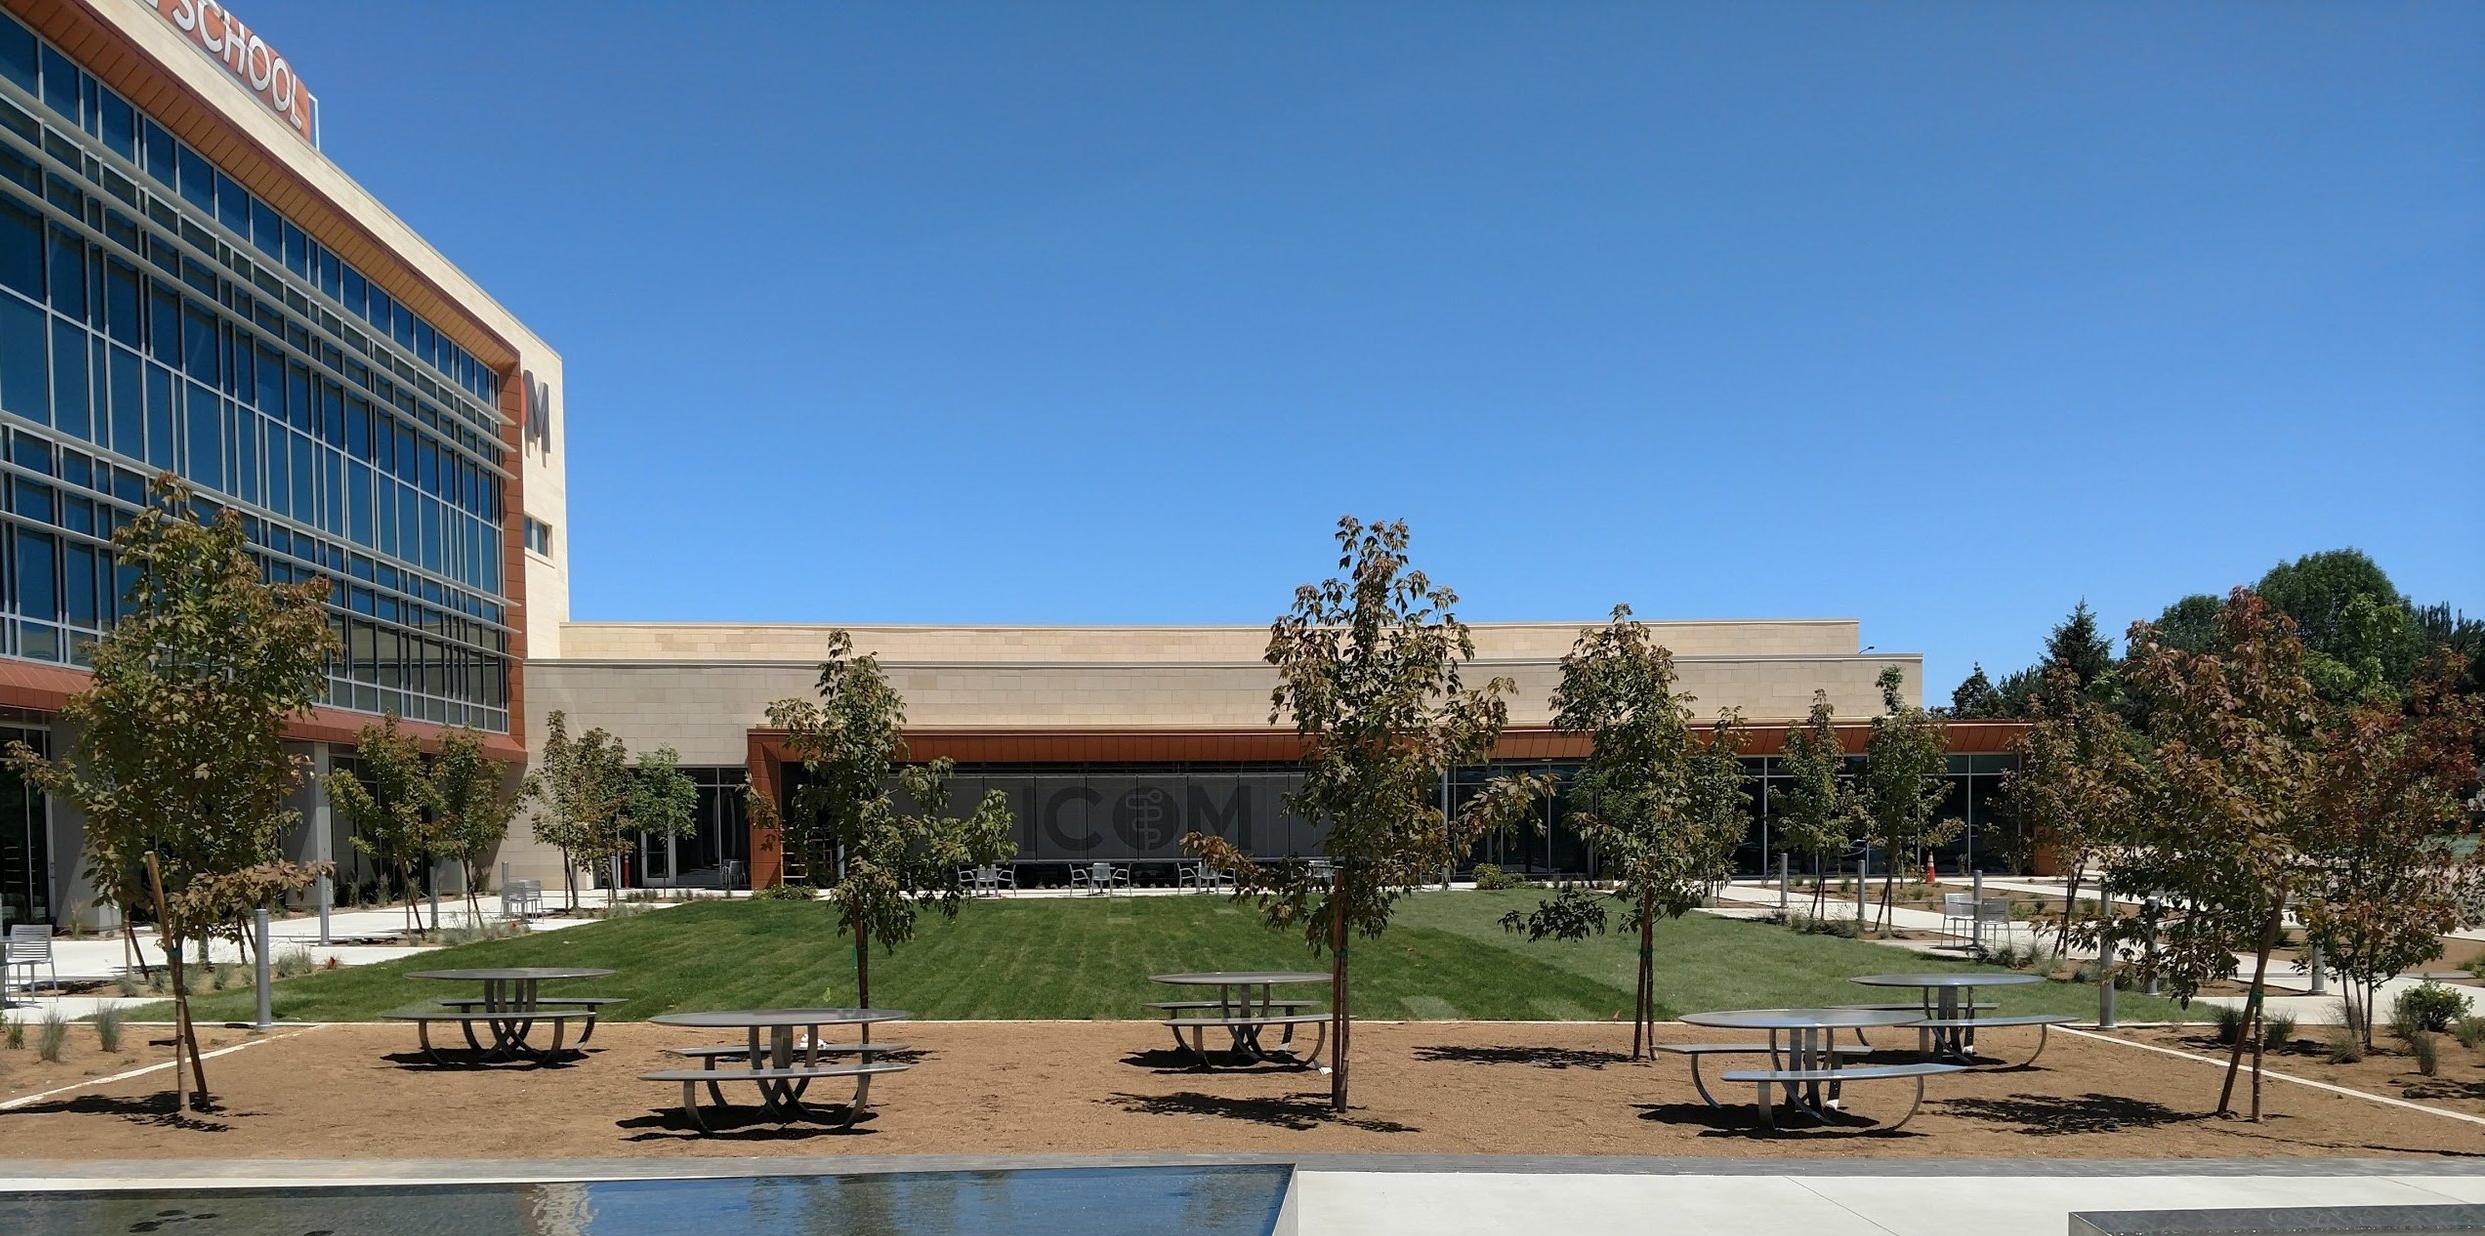 ICOM Courtyard.jpg